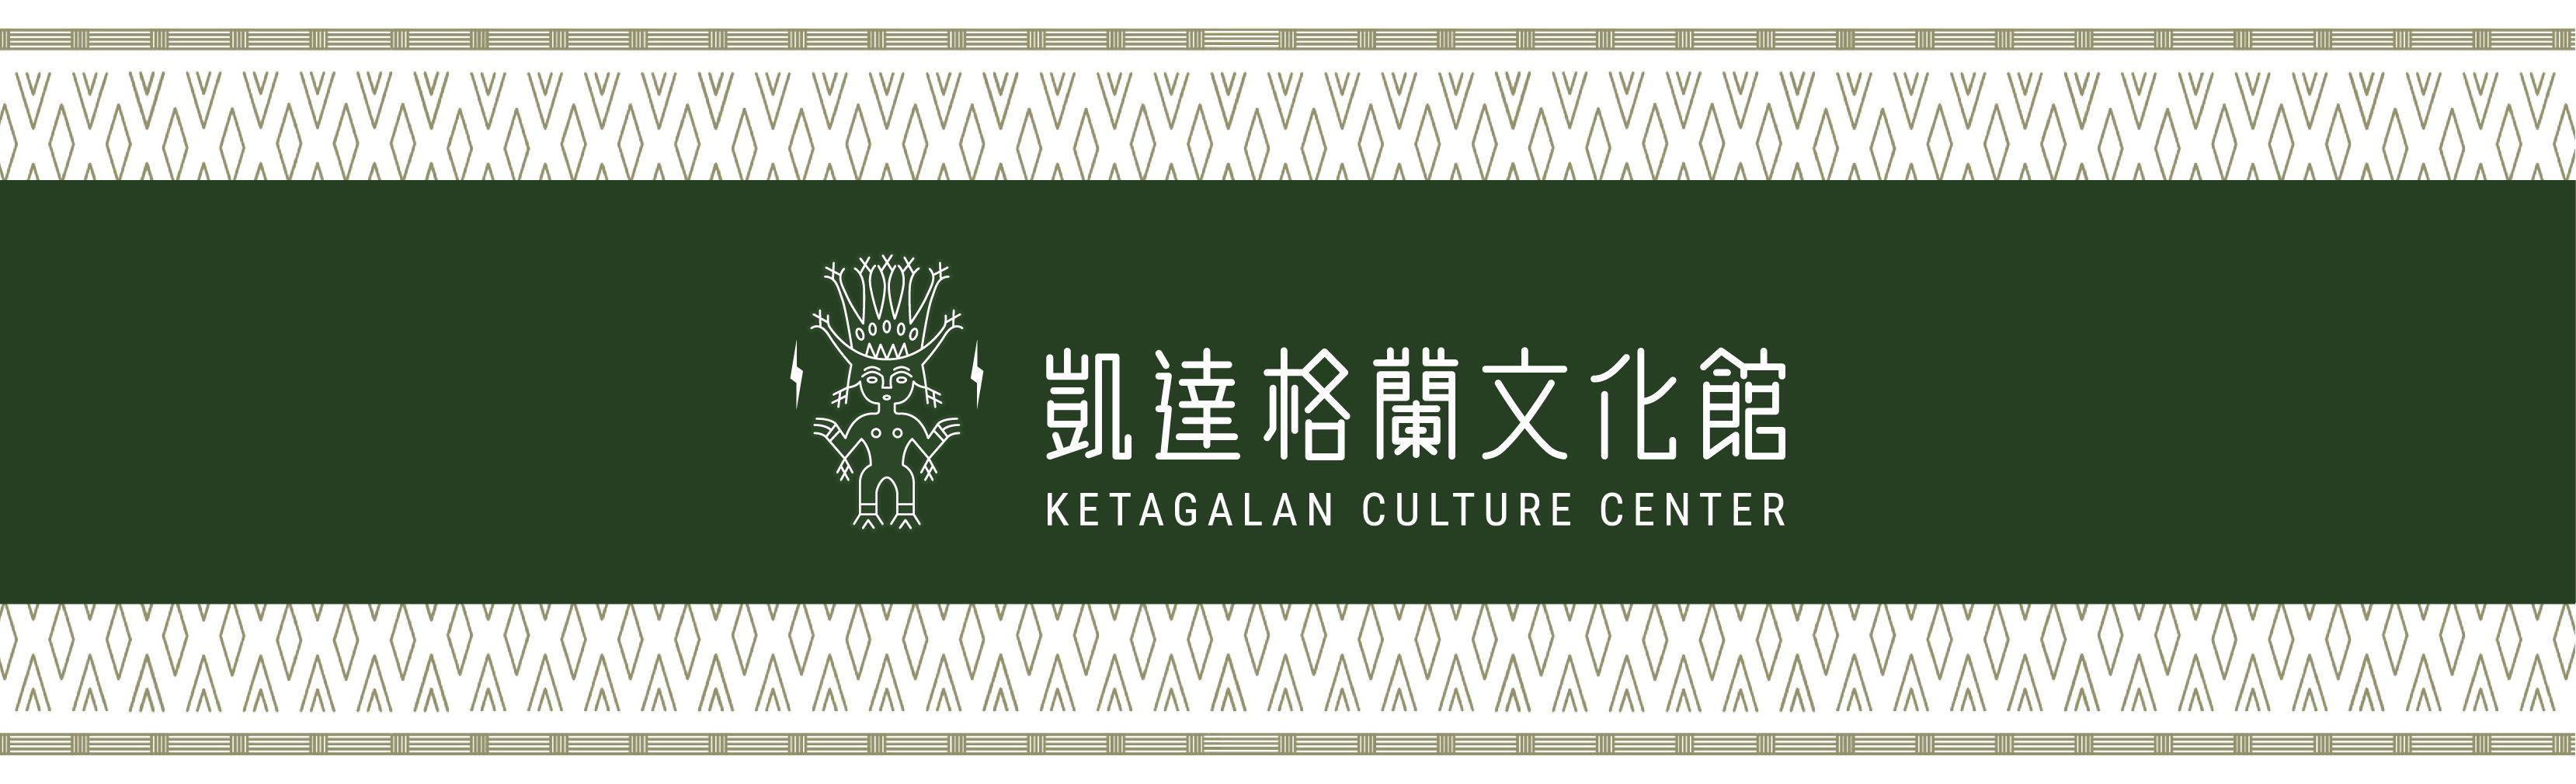 凱達格蘭文化館_banner